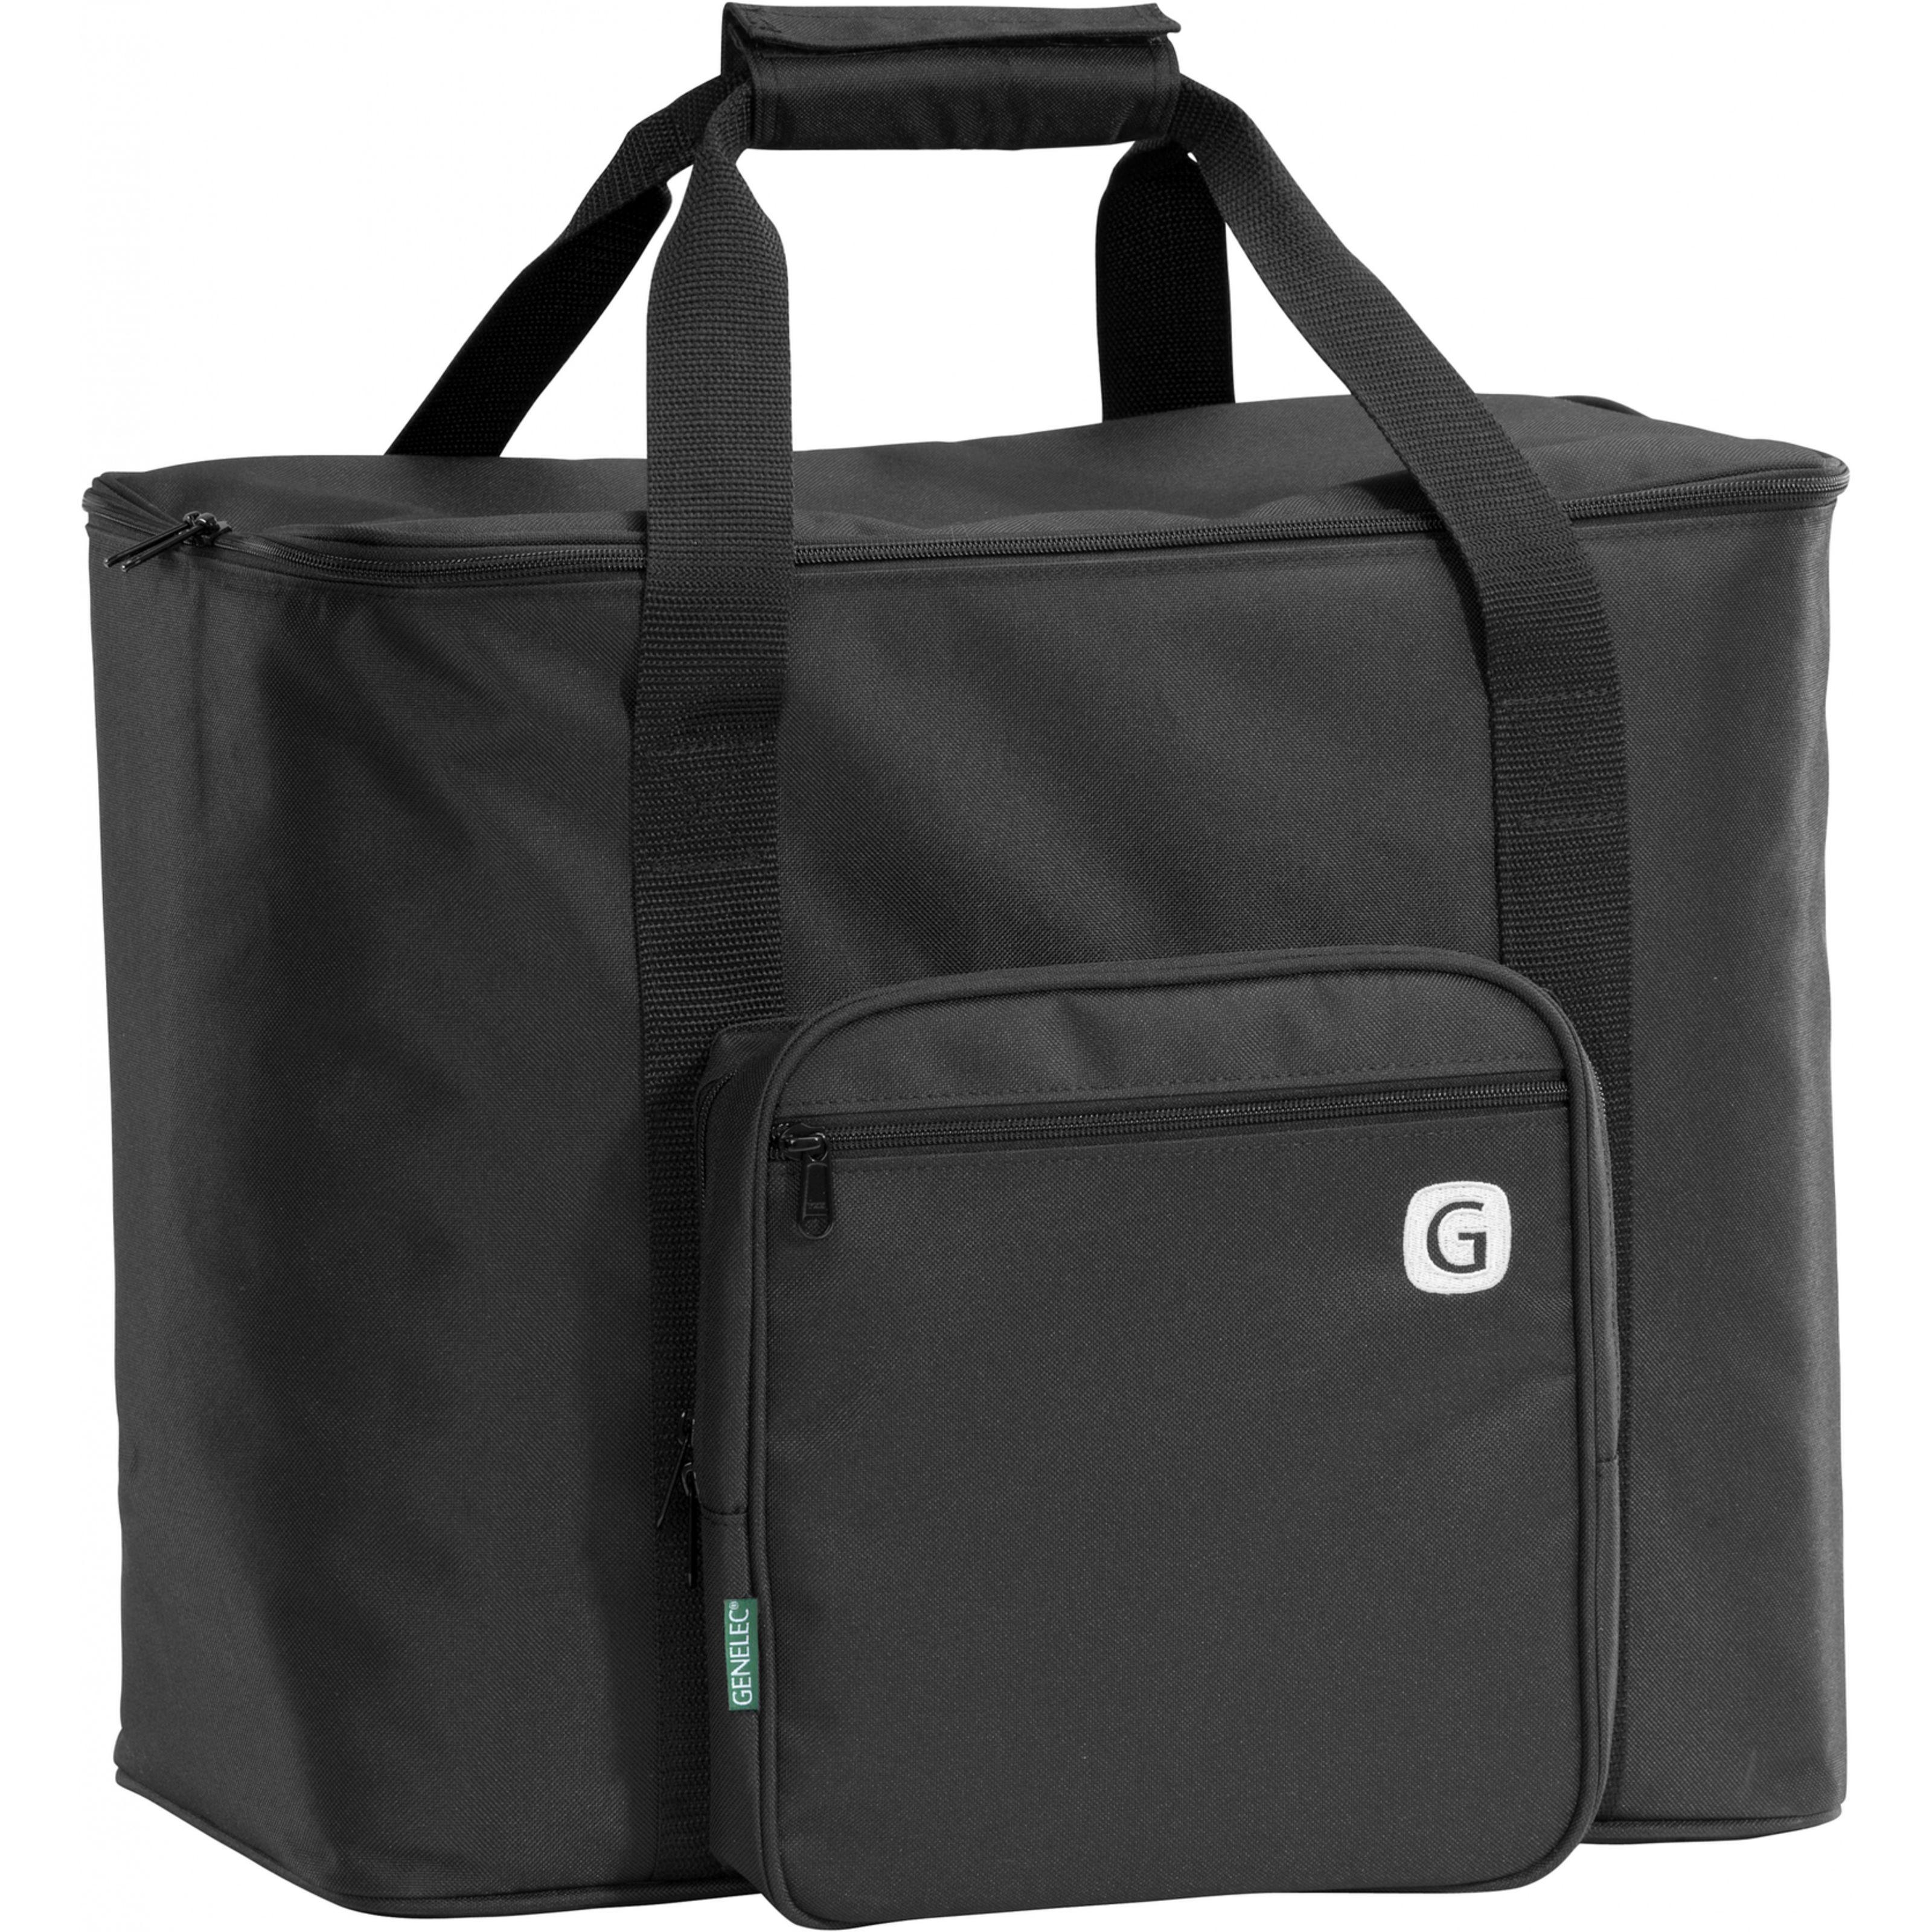 Genelec - 8040-423